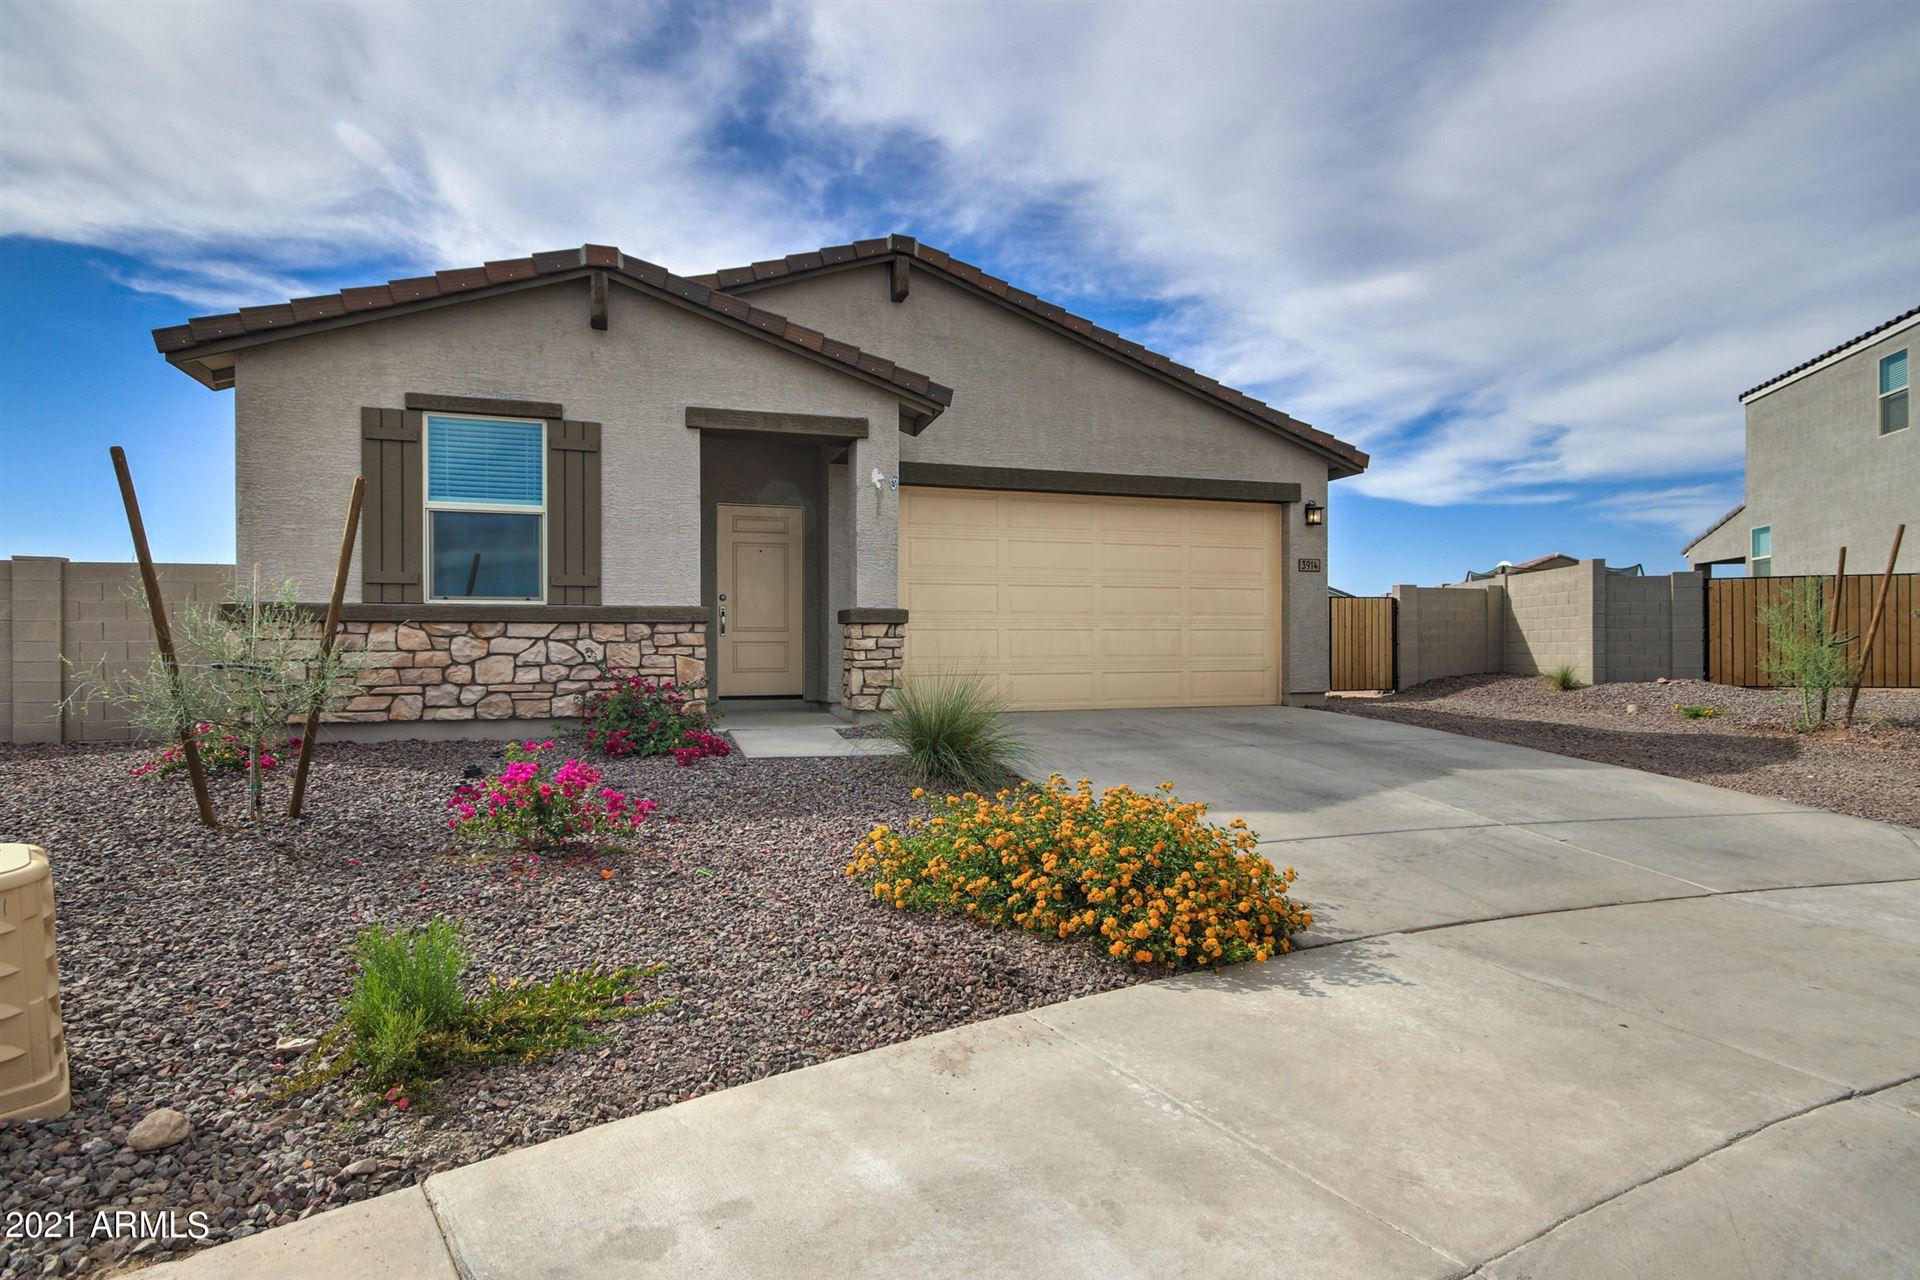 Photo of 3914 E Losino Avenue, San Tan Valley, AZ 85140 (MLS # 6249883)